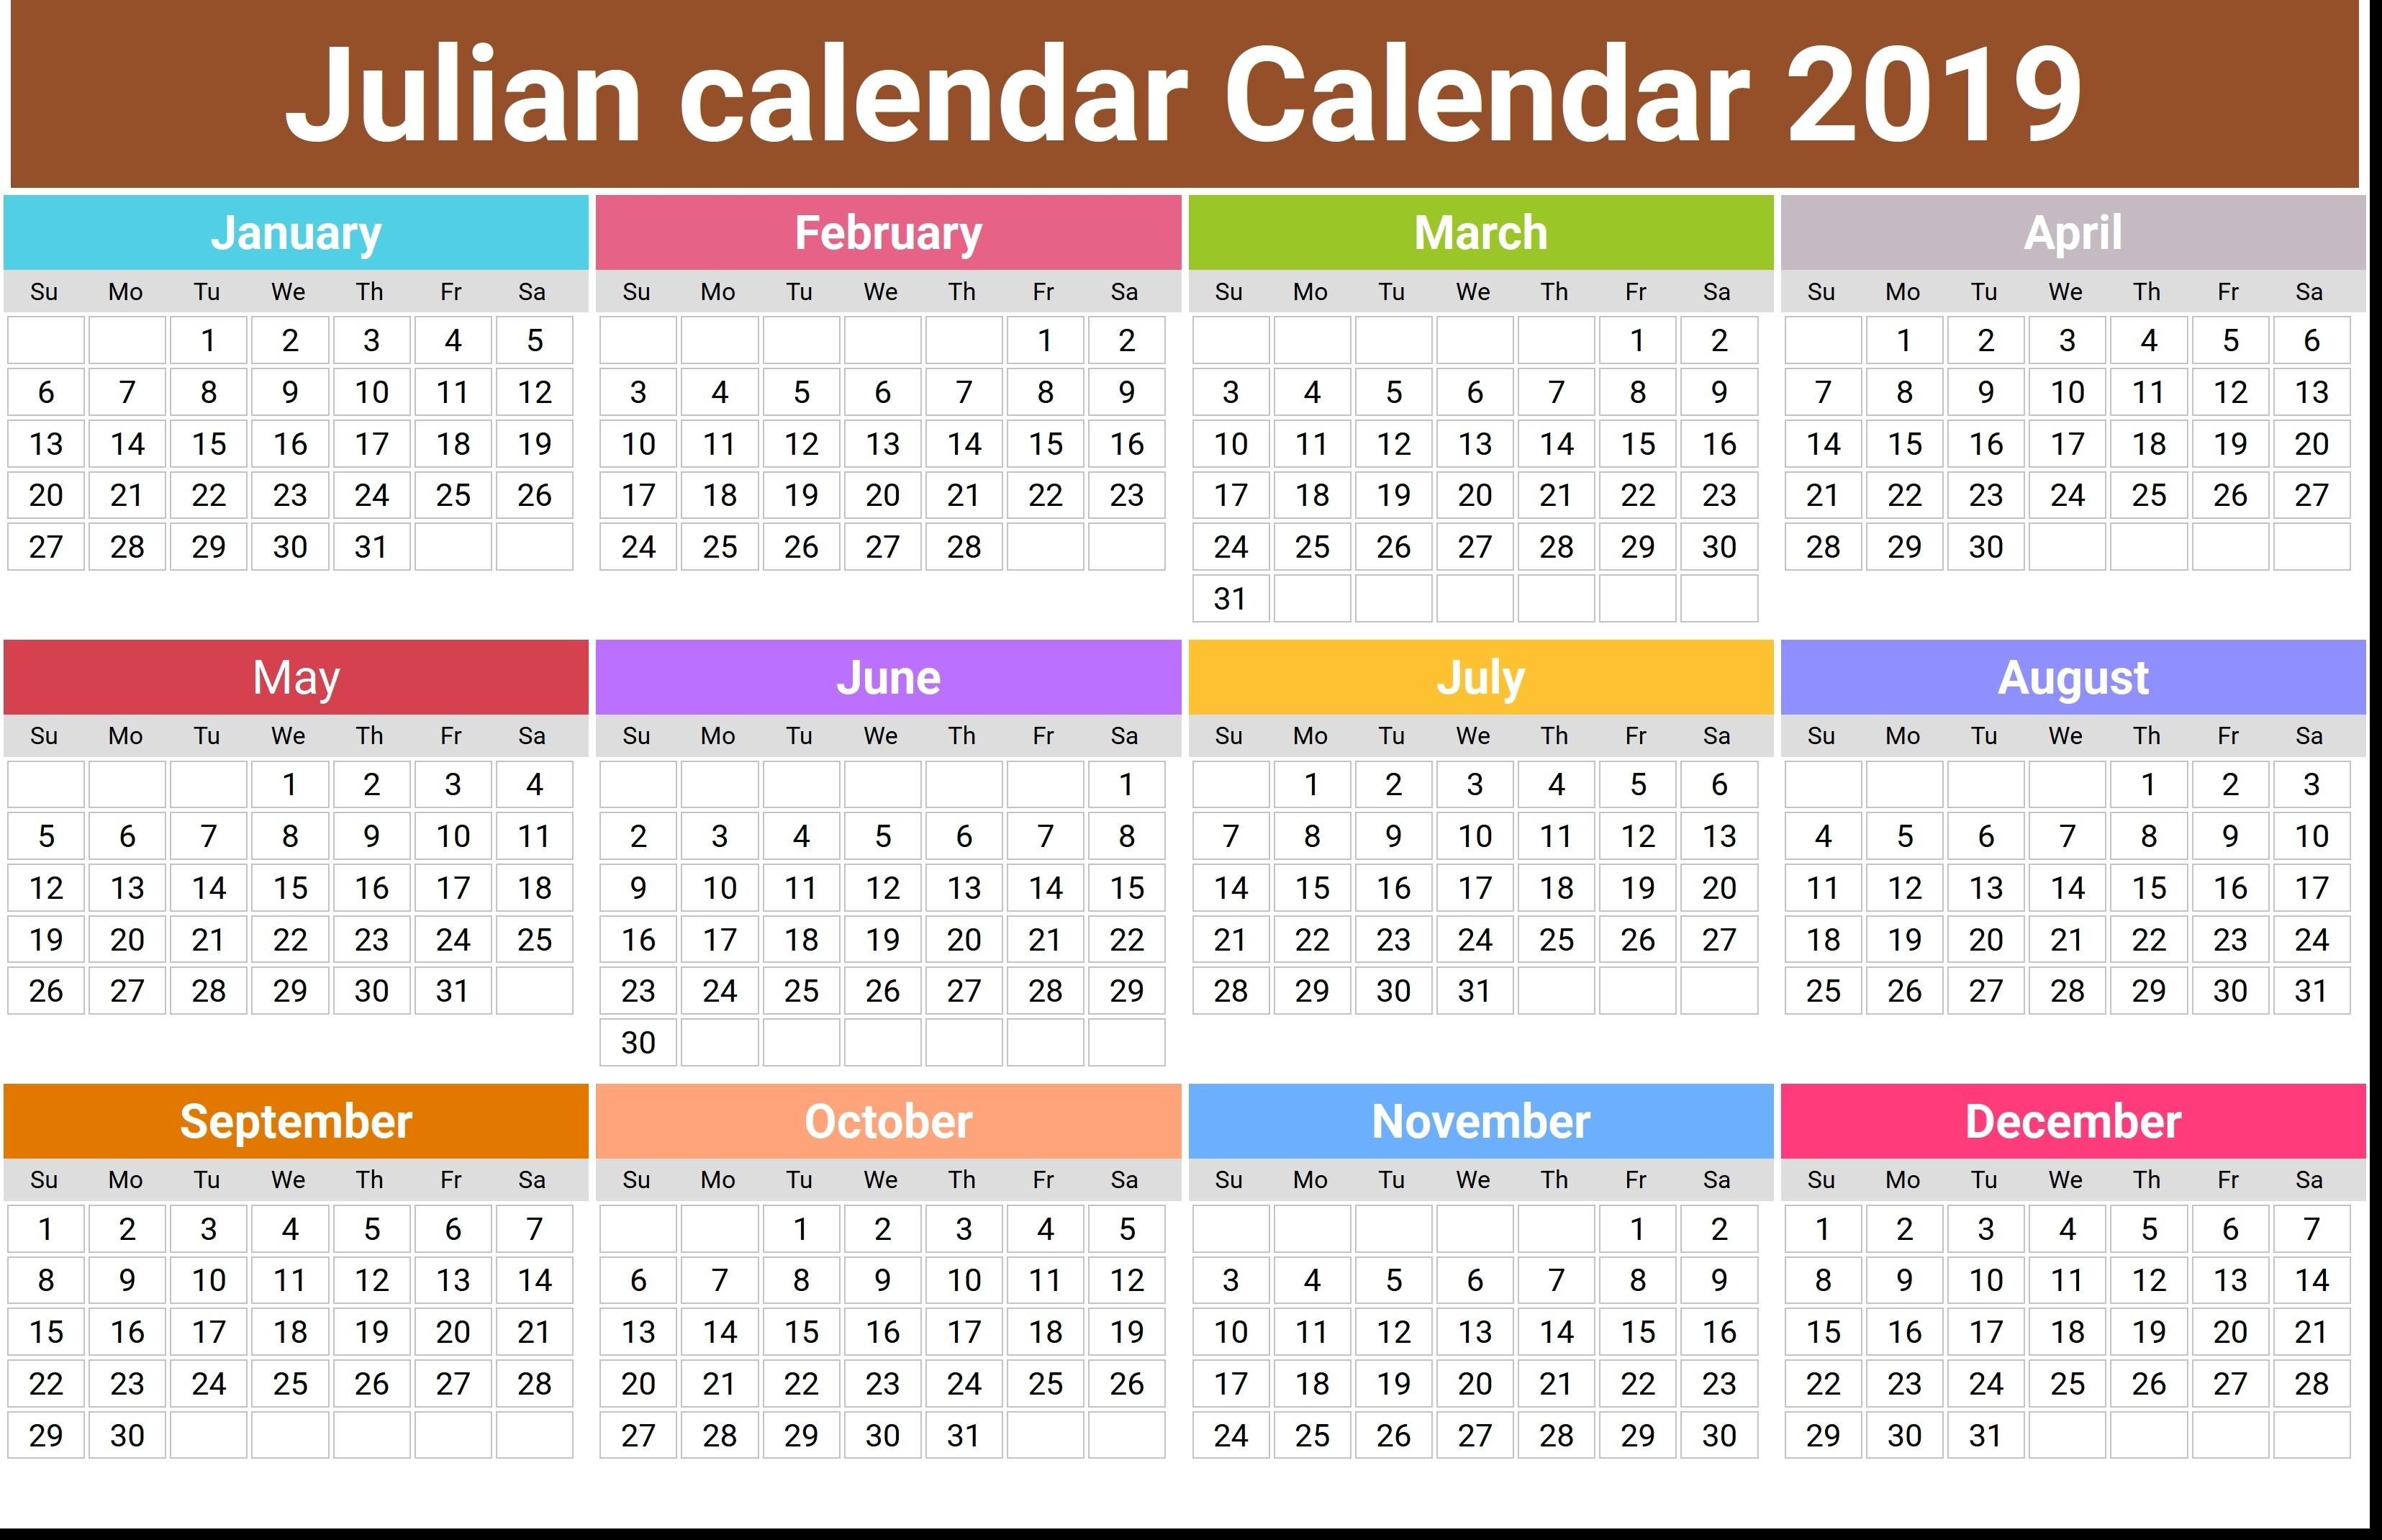 Julian Calendar 2020 2020 Template | Example Calendar Printable regarding Julian Calendar 2020 Quadax